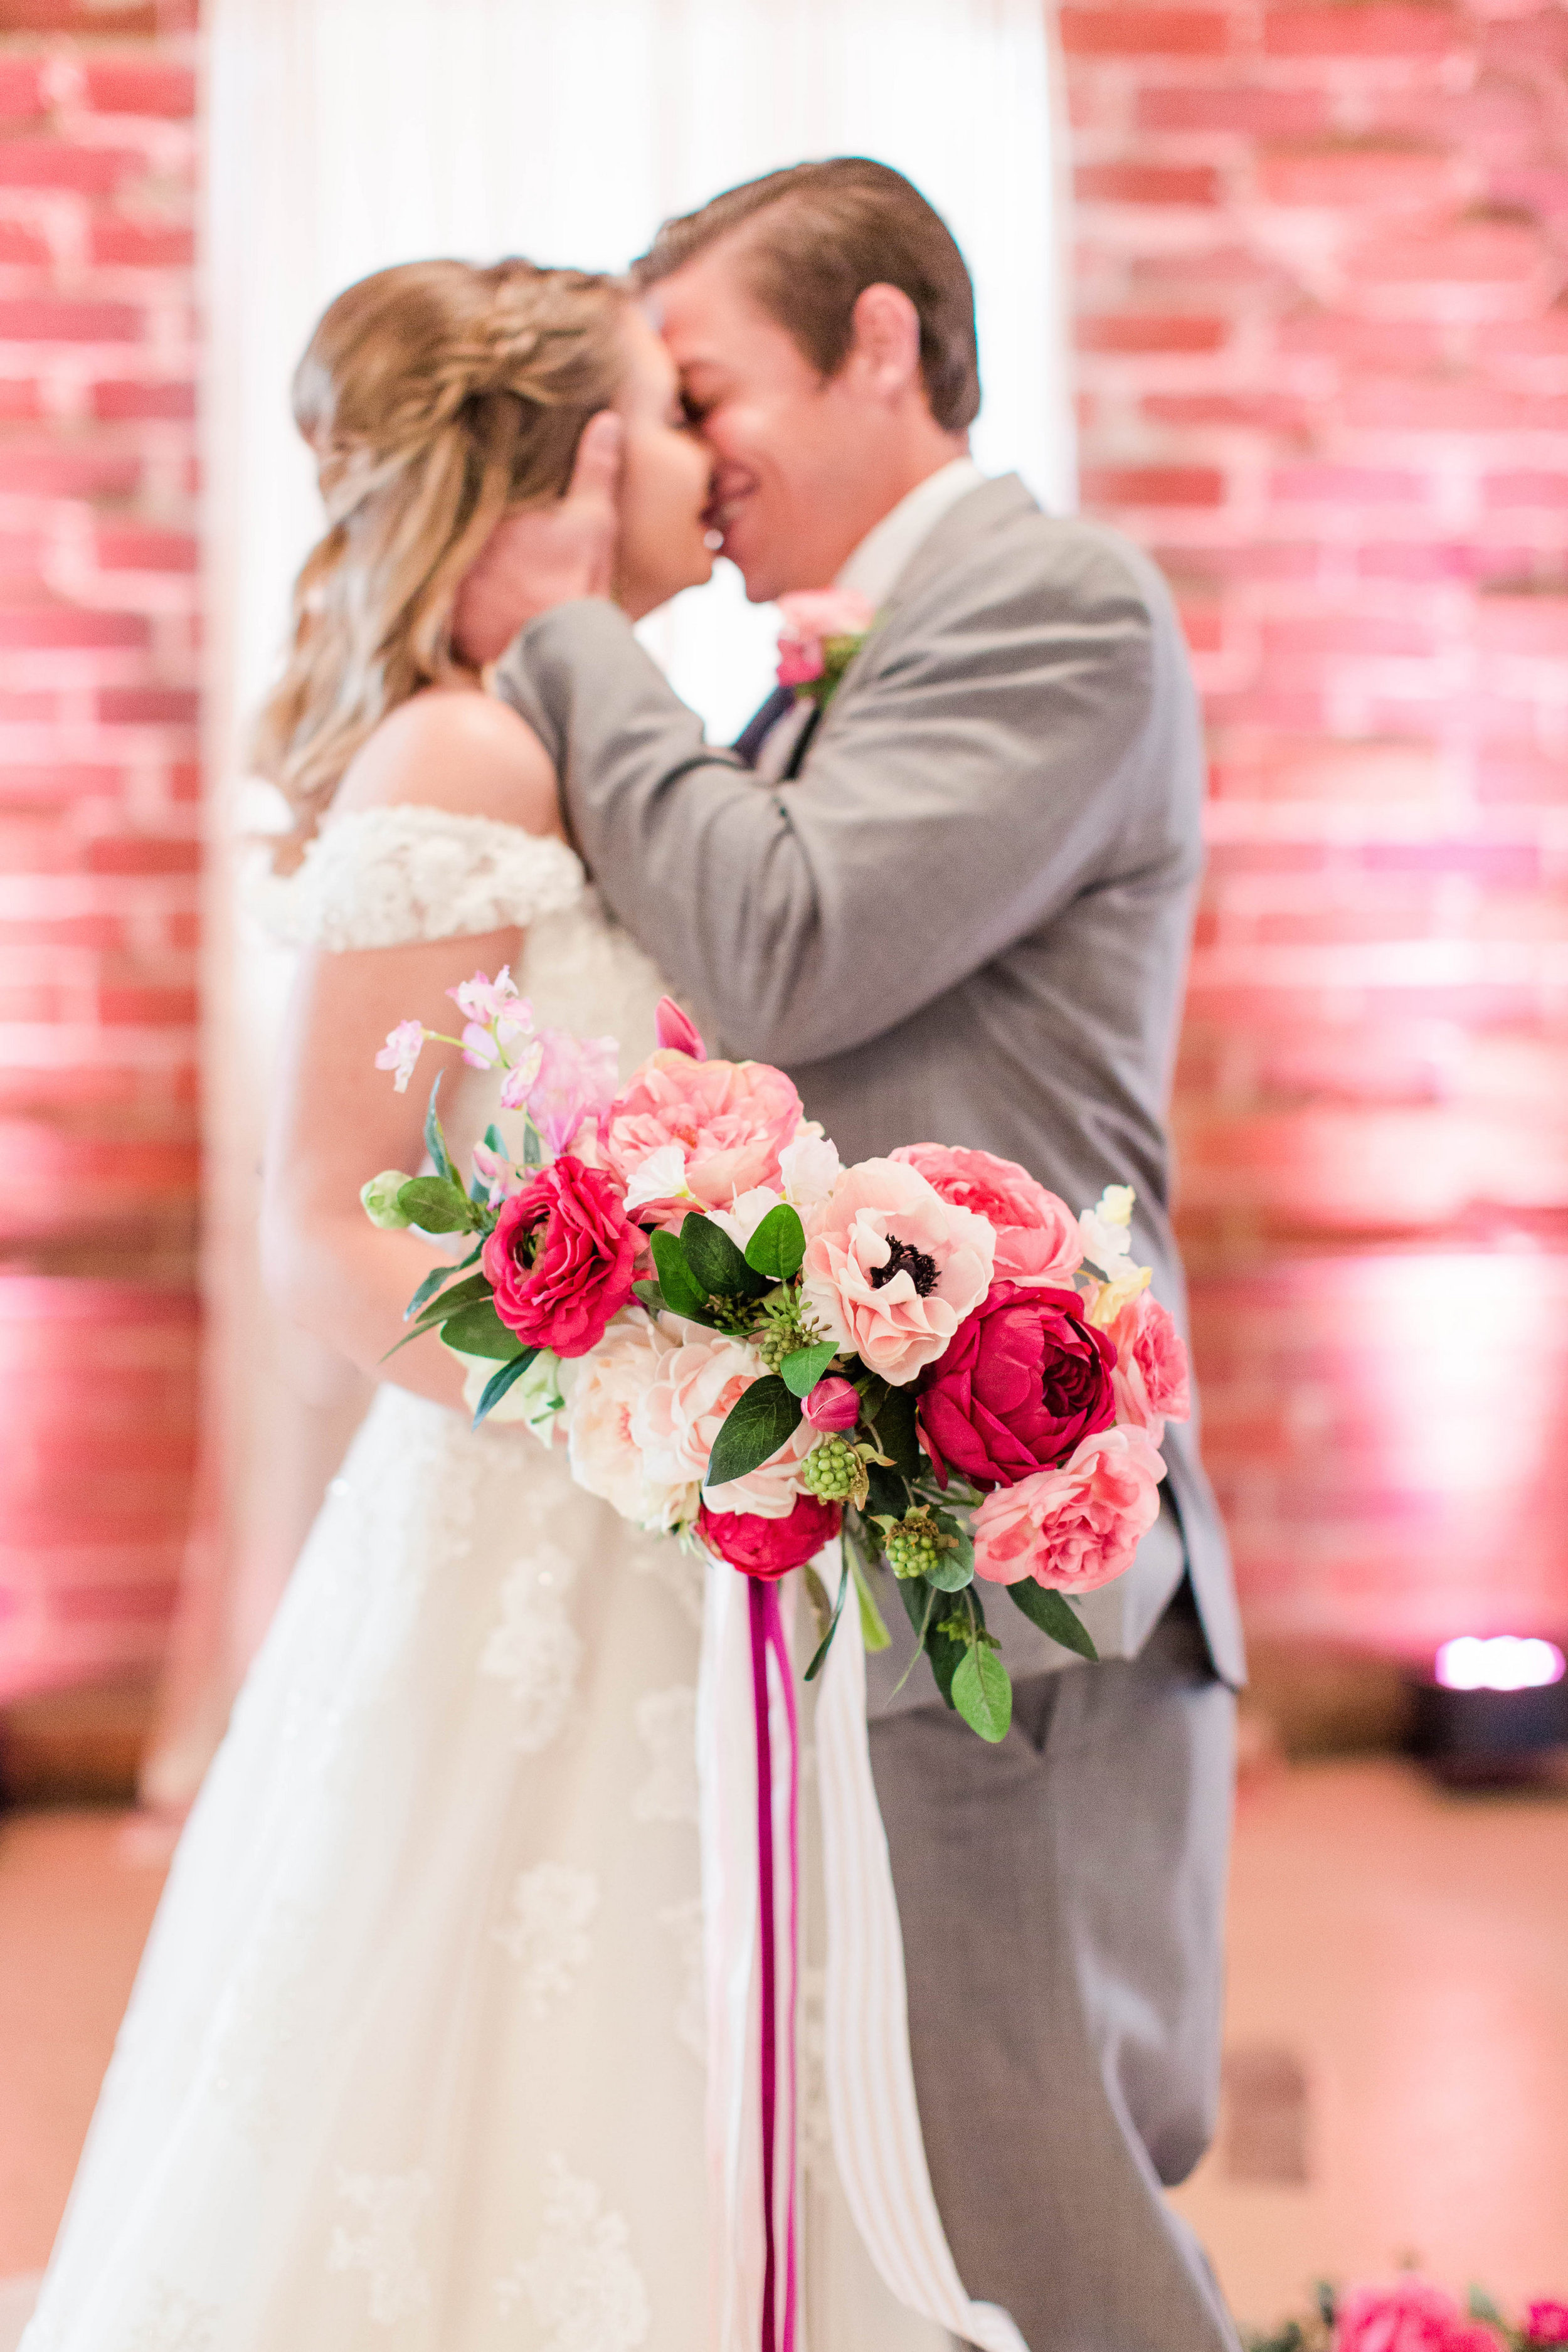 afloral-fake-flower-wedding-ivory-and-beau-bridal-boutique-maggie-sottero-saffron-the-hall-on-vine-wedding-statesboro-wedding-savannah-wedding-kristian-designs-rachel-strickland-photography-savannah-bridal-southern-bride-savannah-bride-11.jpg